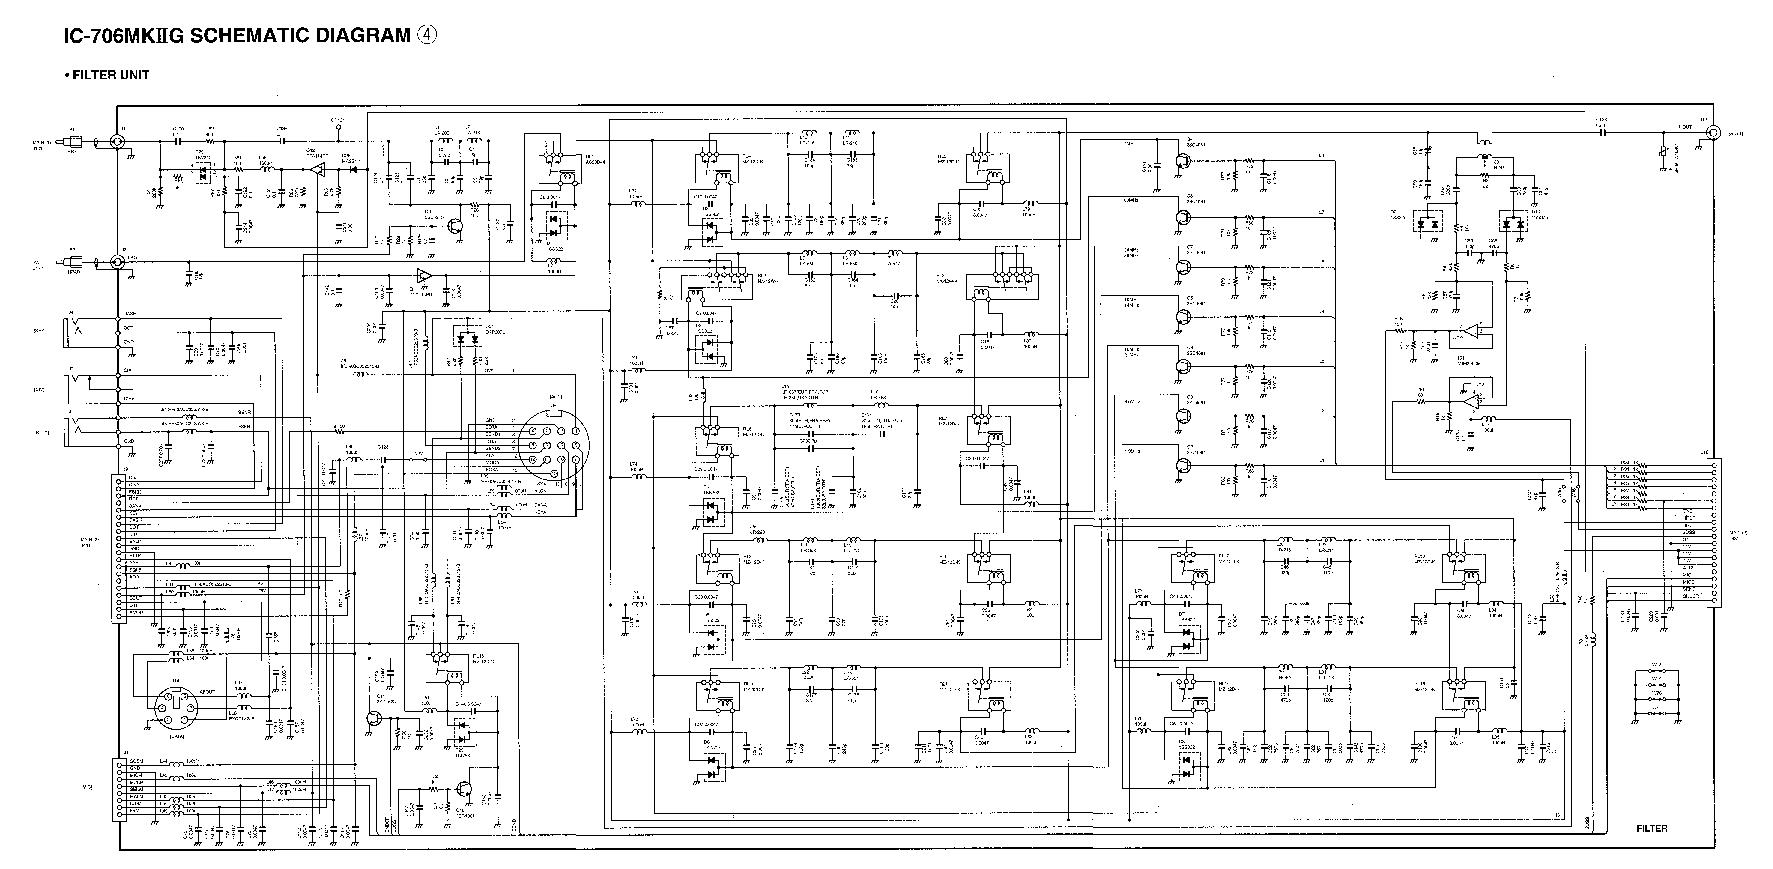 ICOM IC-706MK2G service manual (1st page)